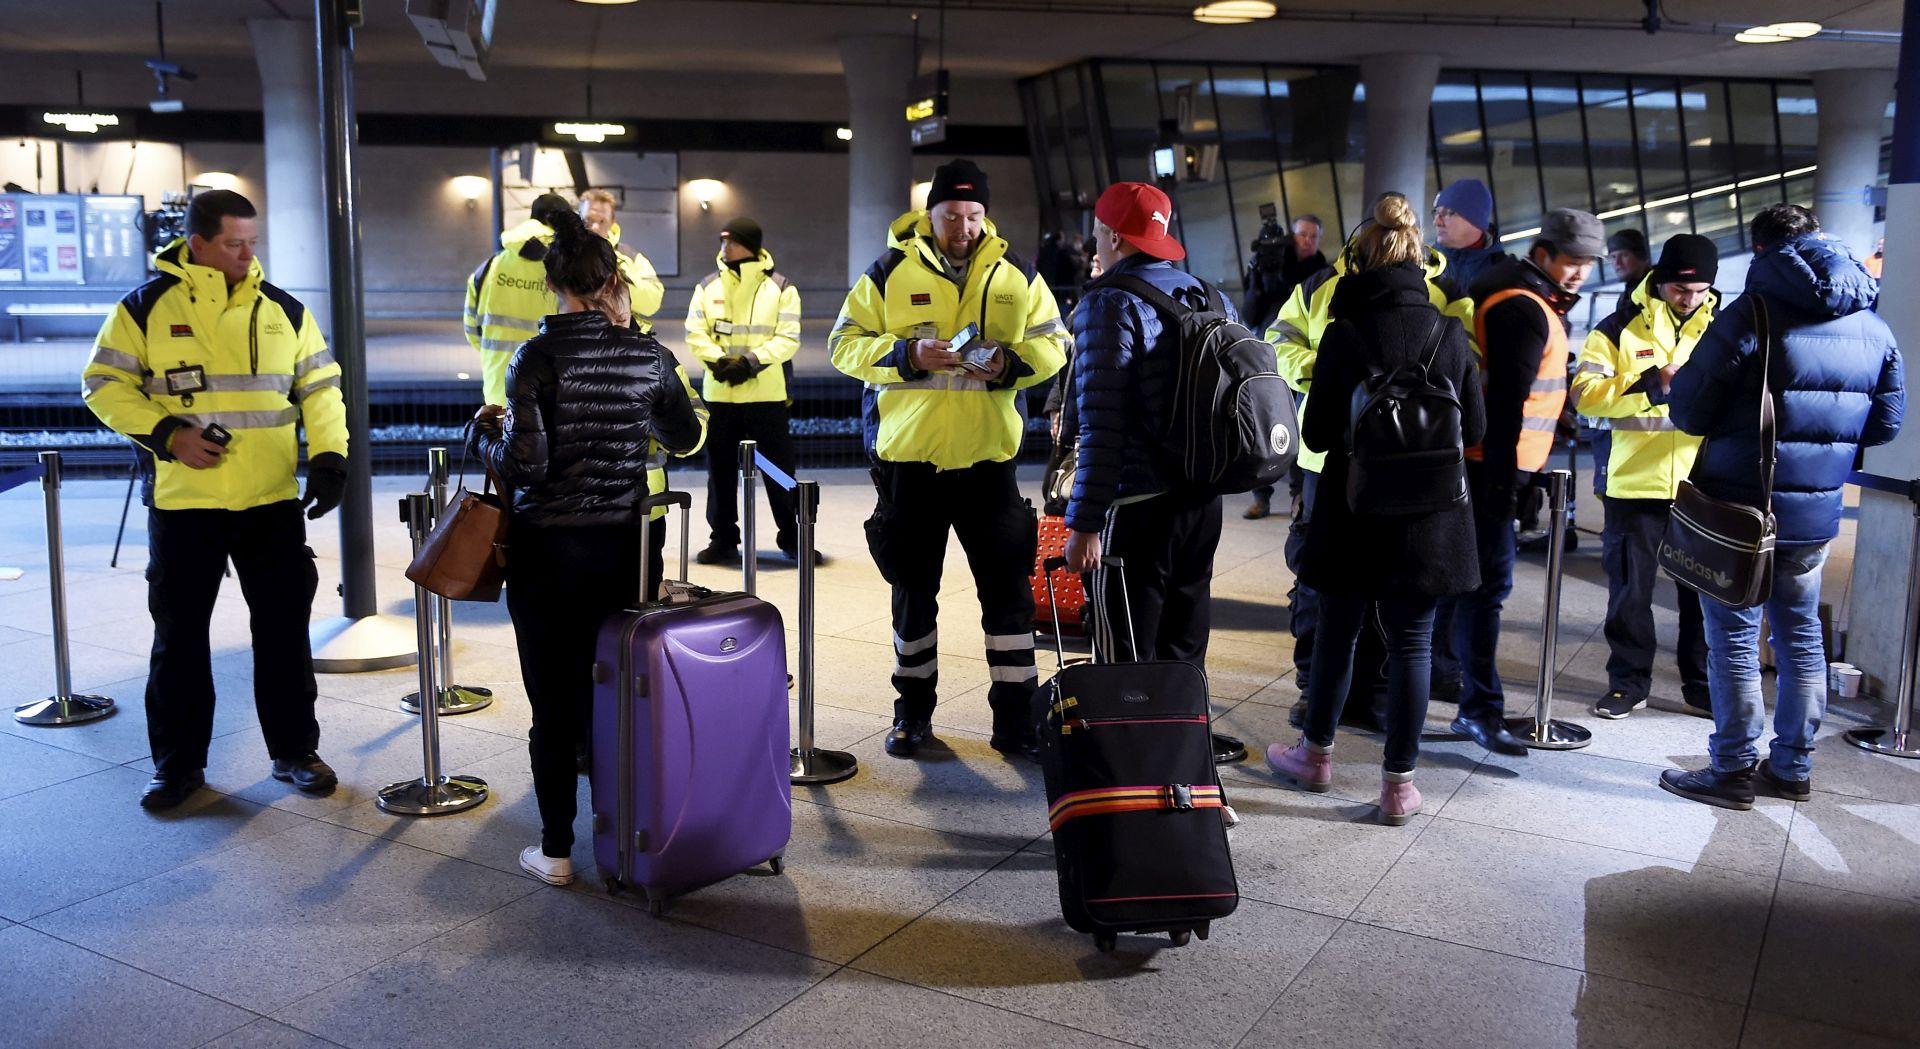 Danska odlučna reformirati zakon o azilantima